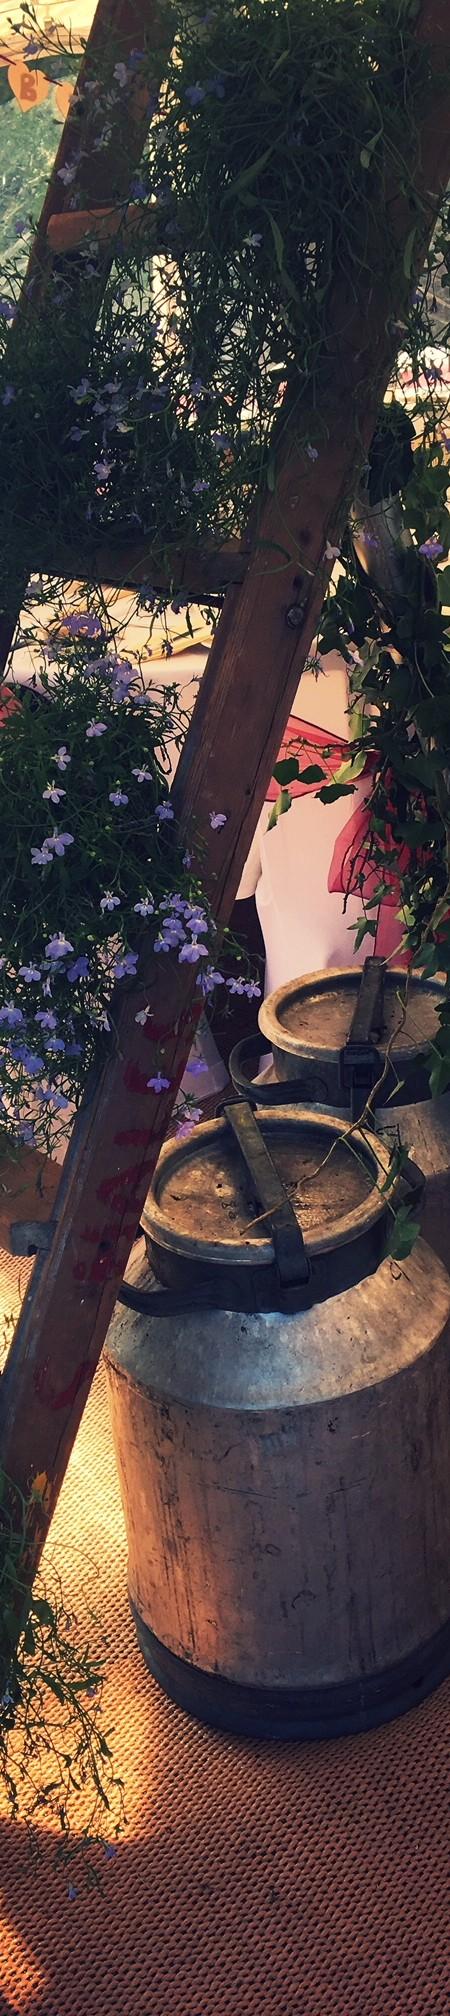 Ladder flower feature